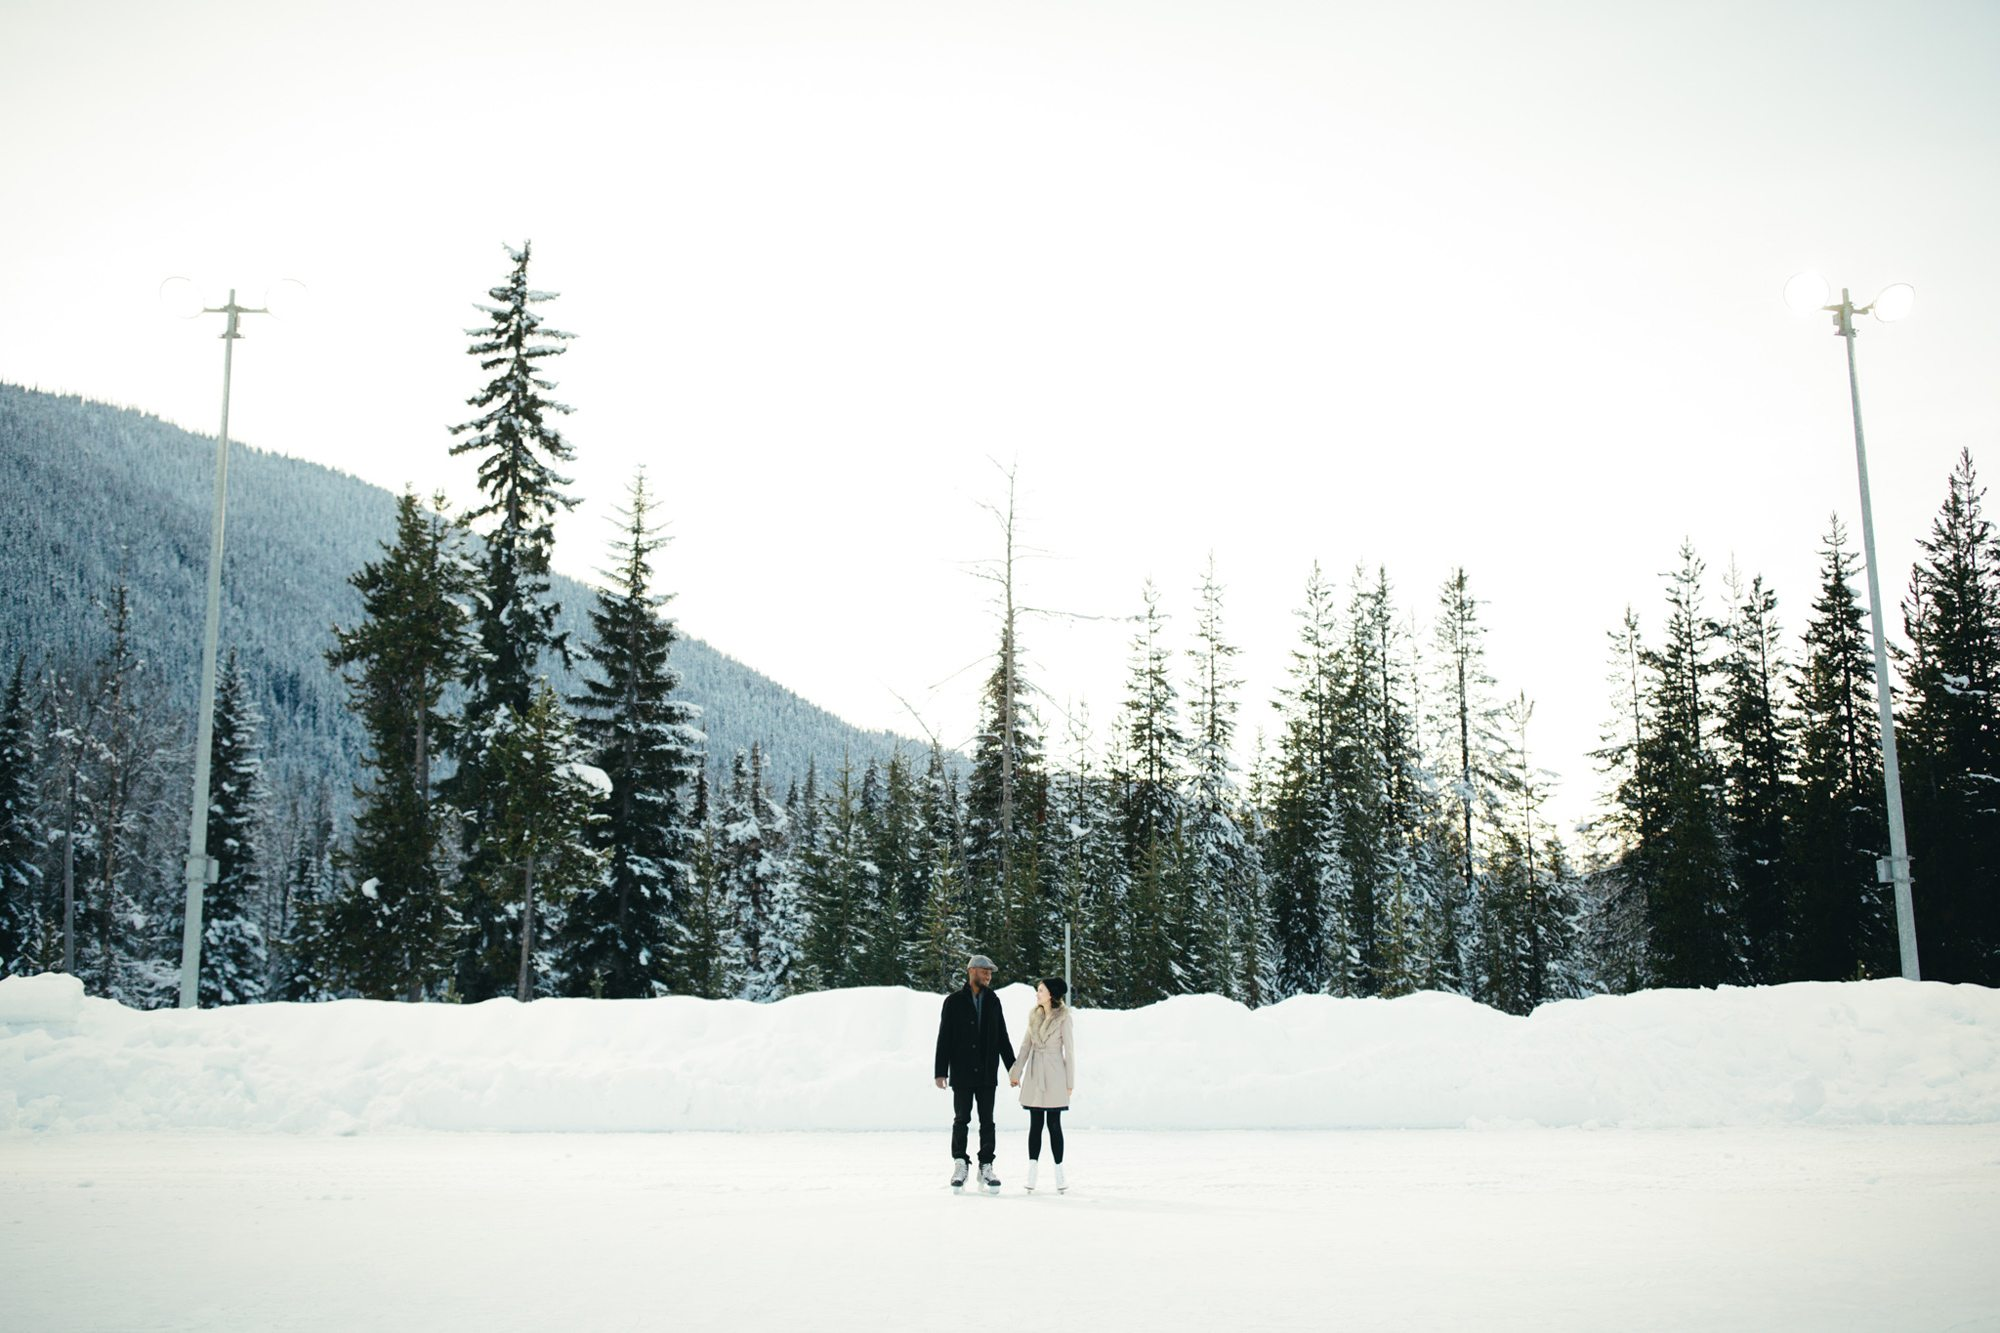 068-adventure-engagement-photographer